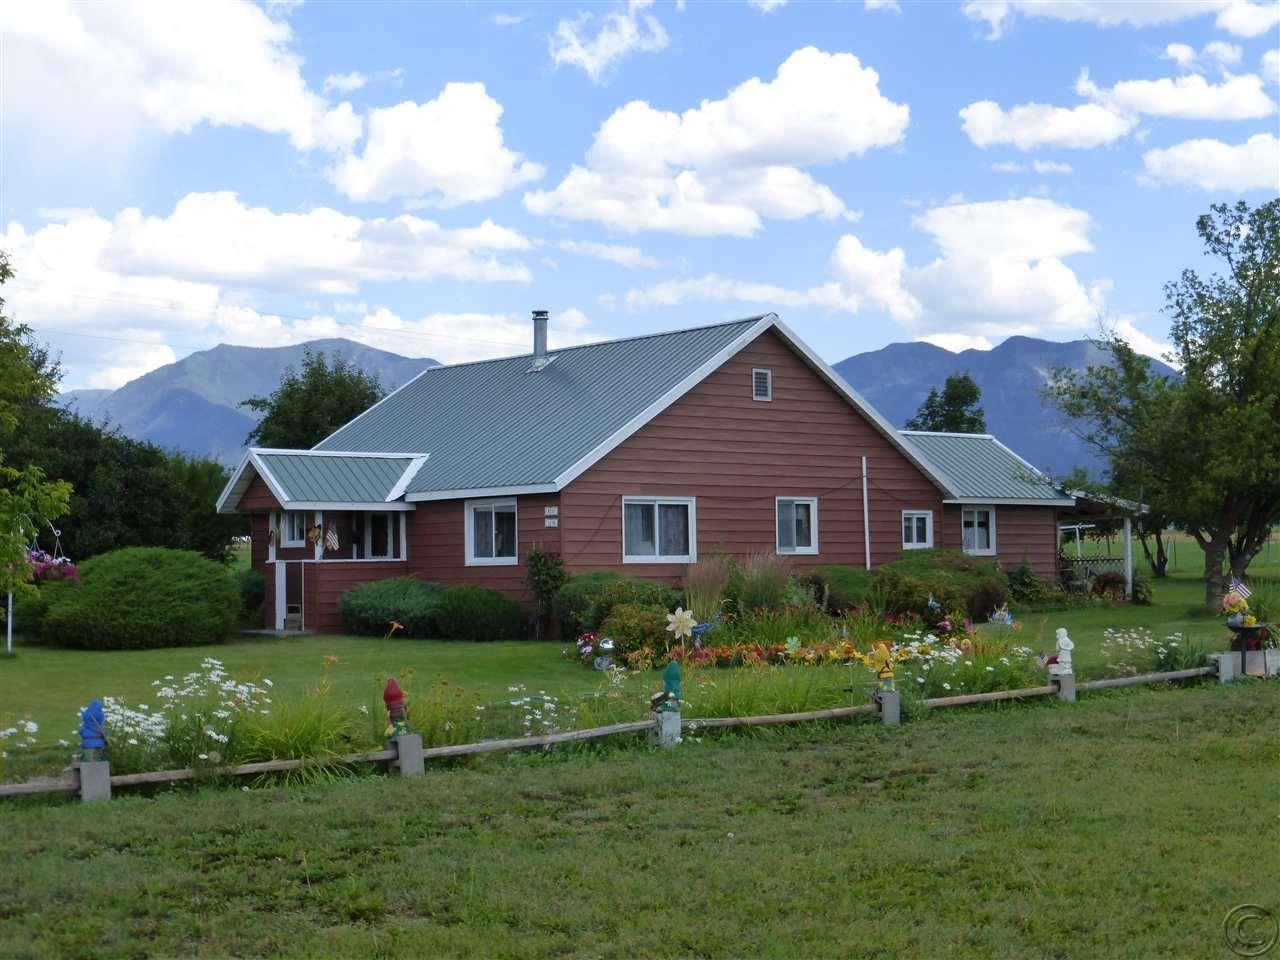 Real Estate for Sale, ListingId: 35776915, Arlee,MT59821